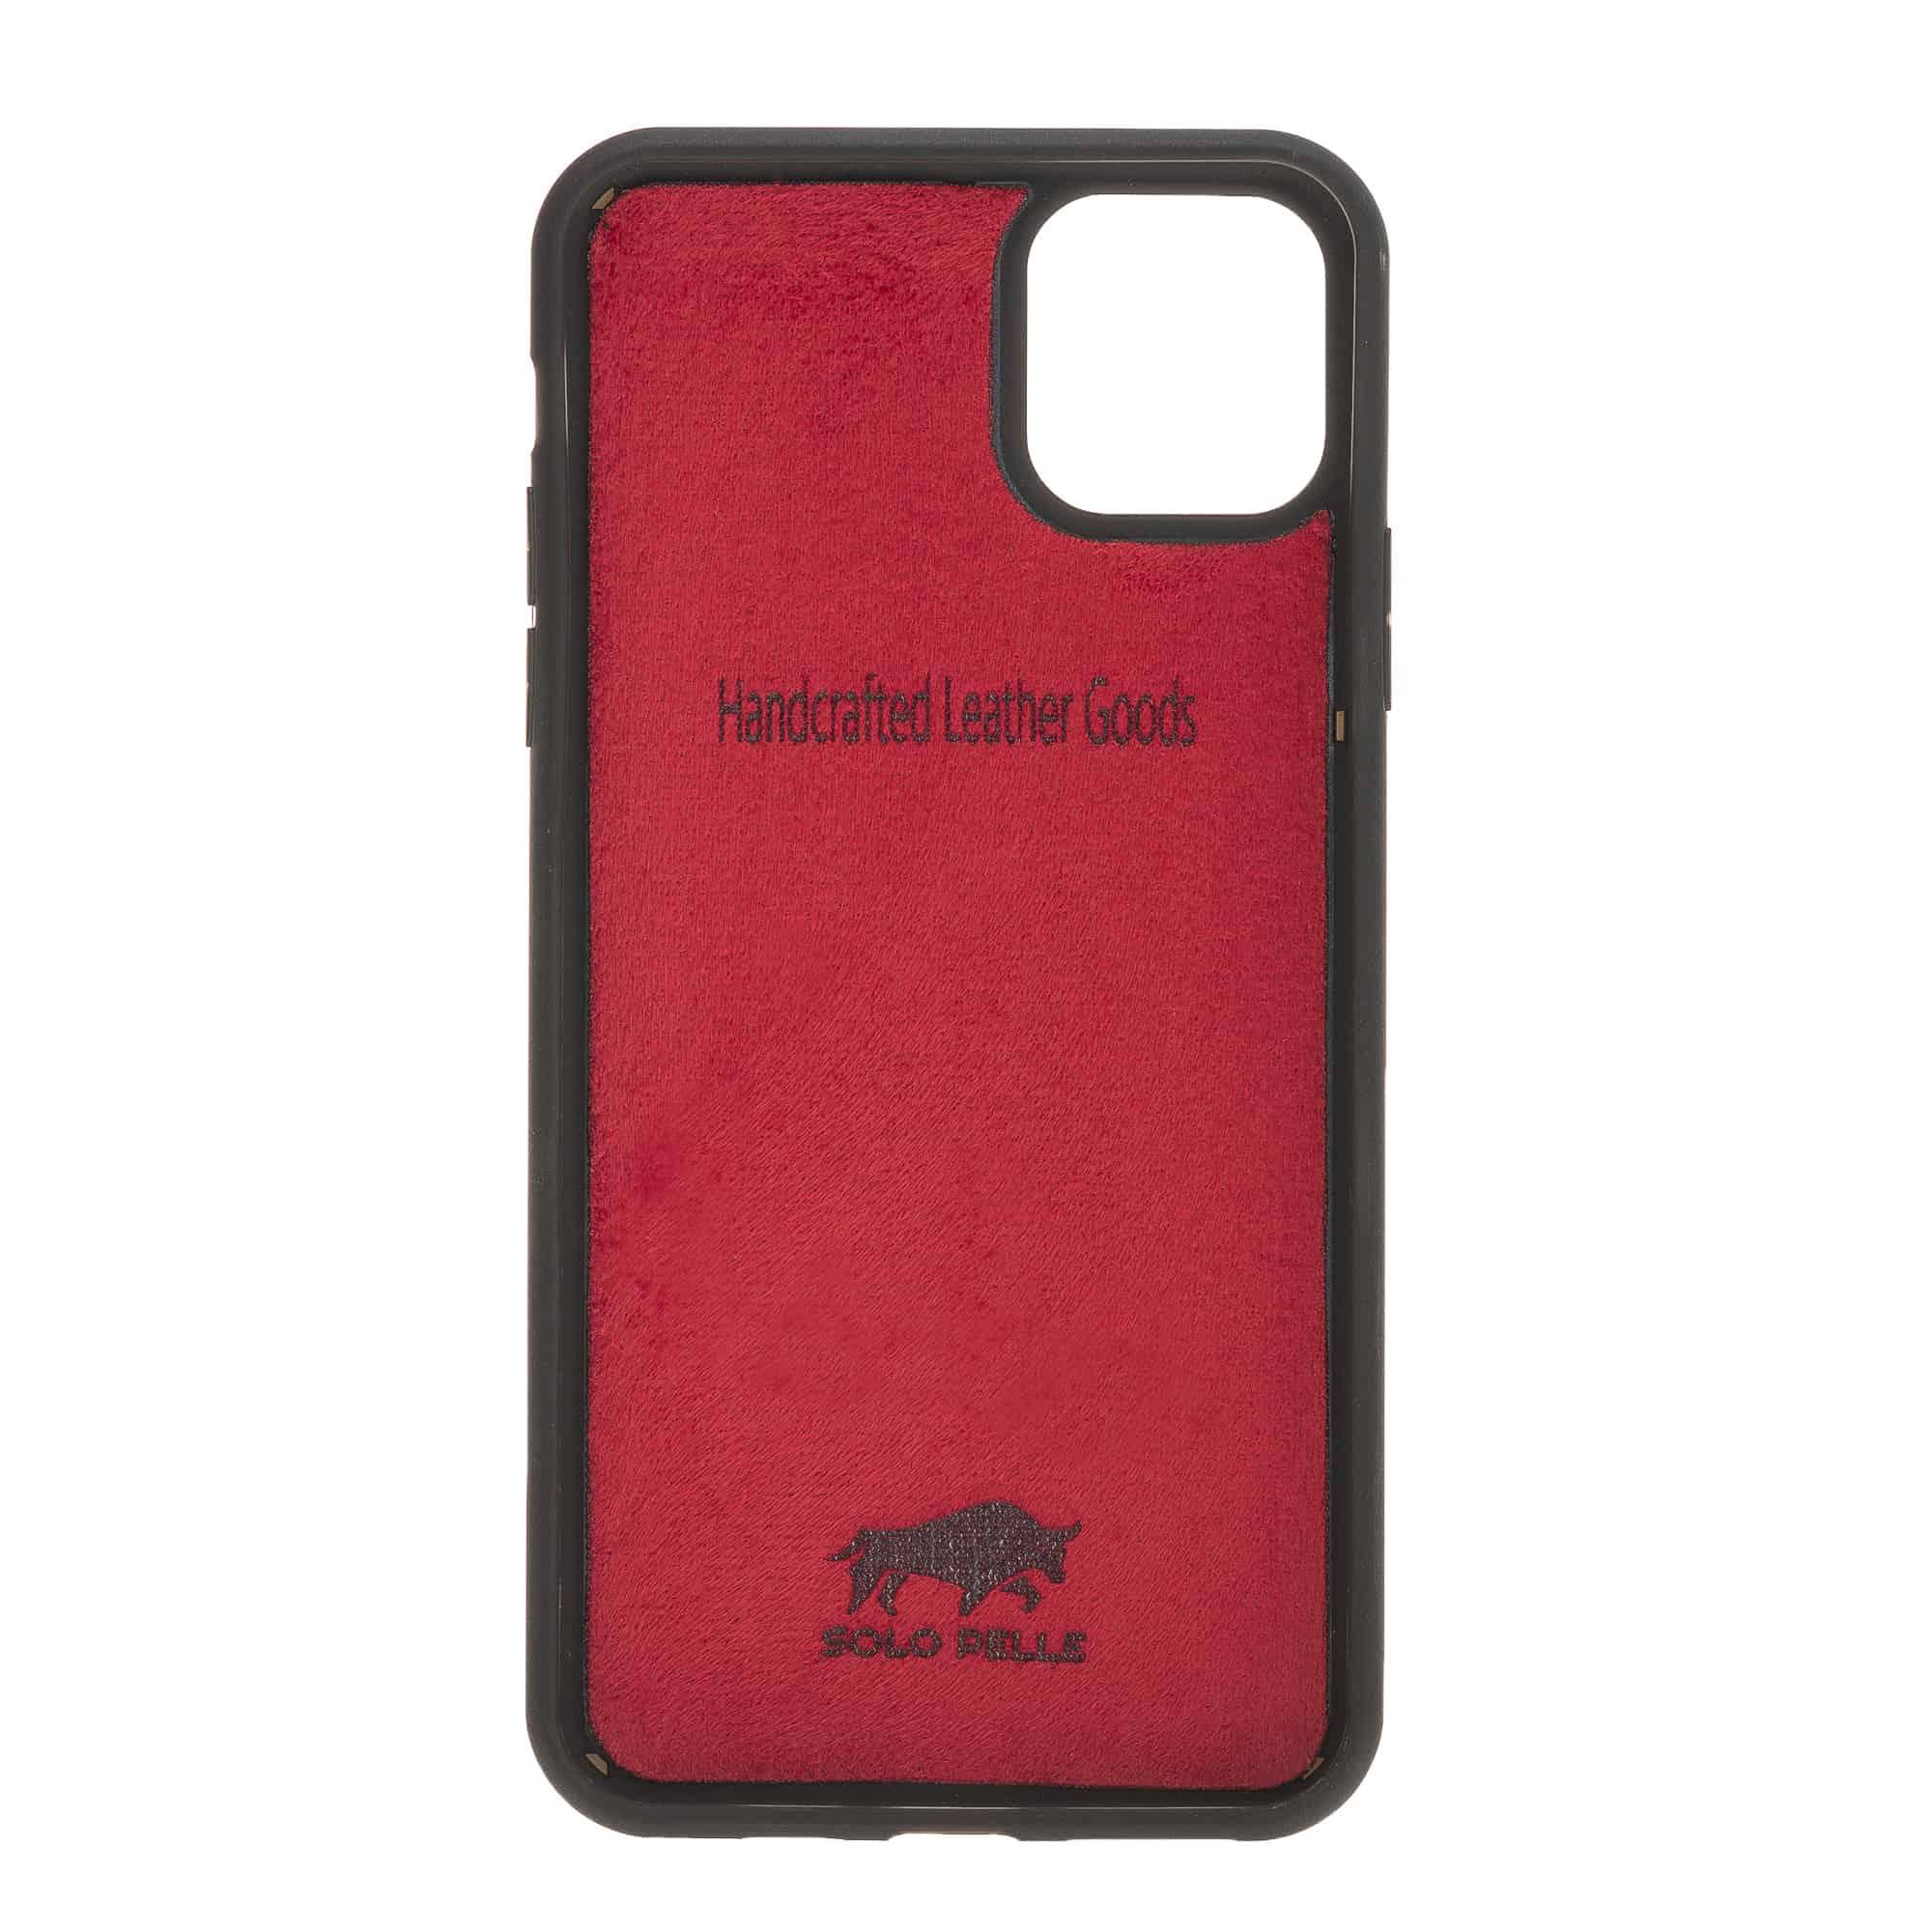 Solo Pelle Lederhülle für das iPhone 11 Pro (Max) 6.5 Zoll Stanford Case Leder Hülle Ledertasche Backcover aus echtem Leder (Rot Burned)